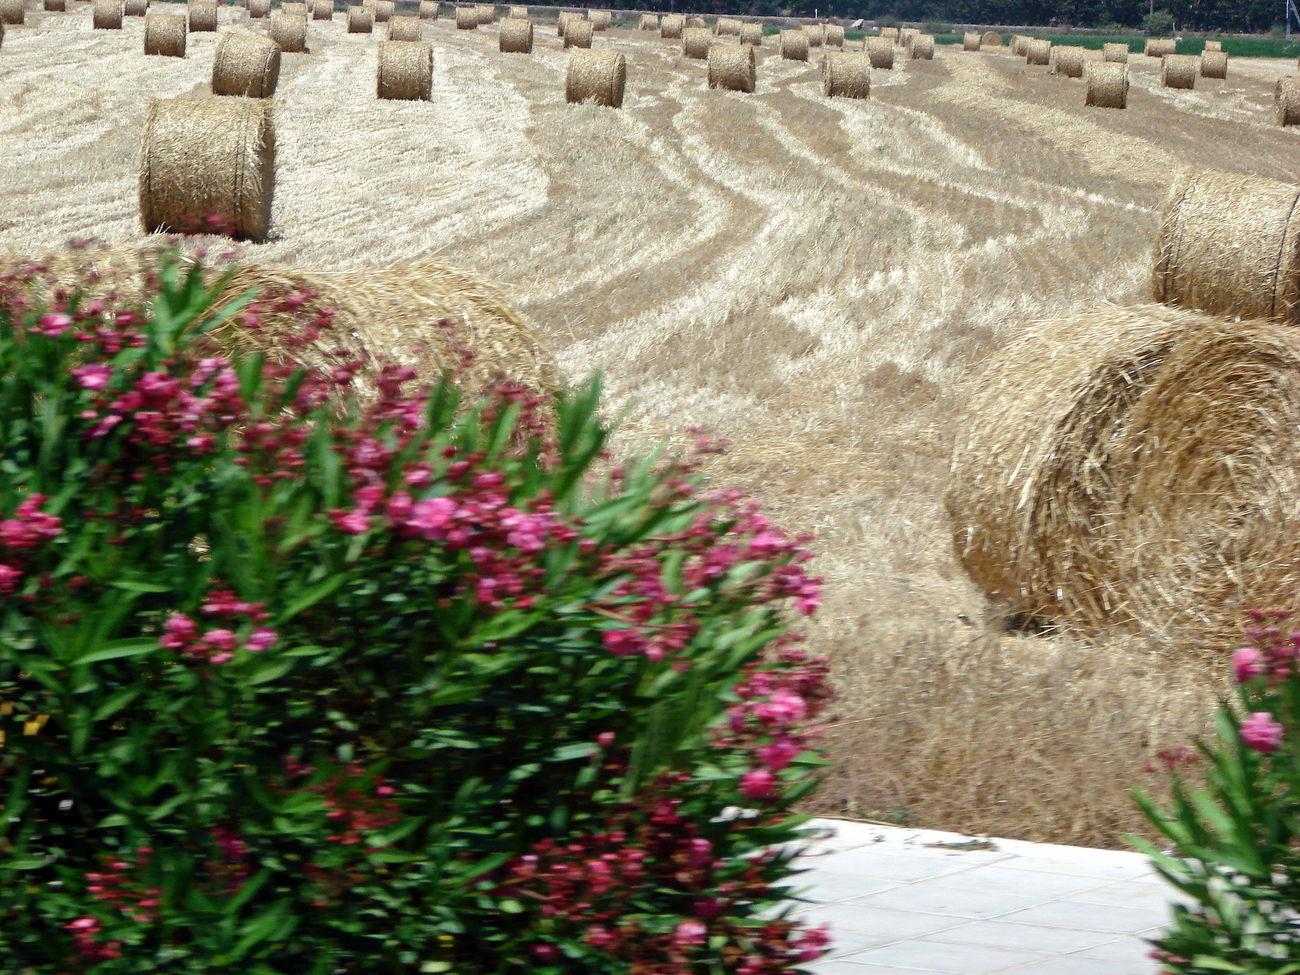 Bush Champ Cyprus Field Flowers Hayrick Haystack Haystacks Meule Yellow Grass The Great Outdoors - 2016 EyeEm Awards